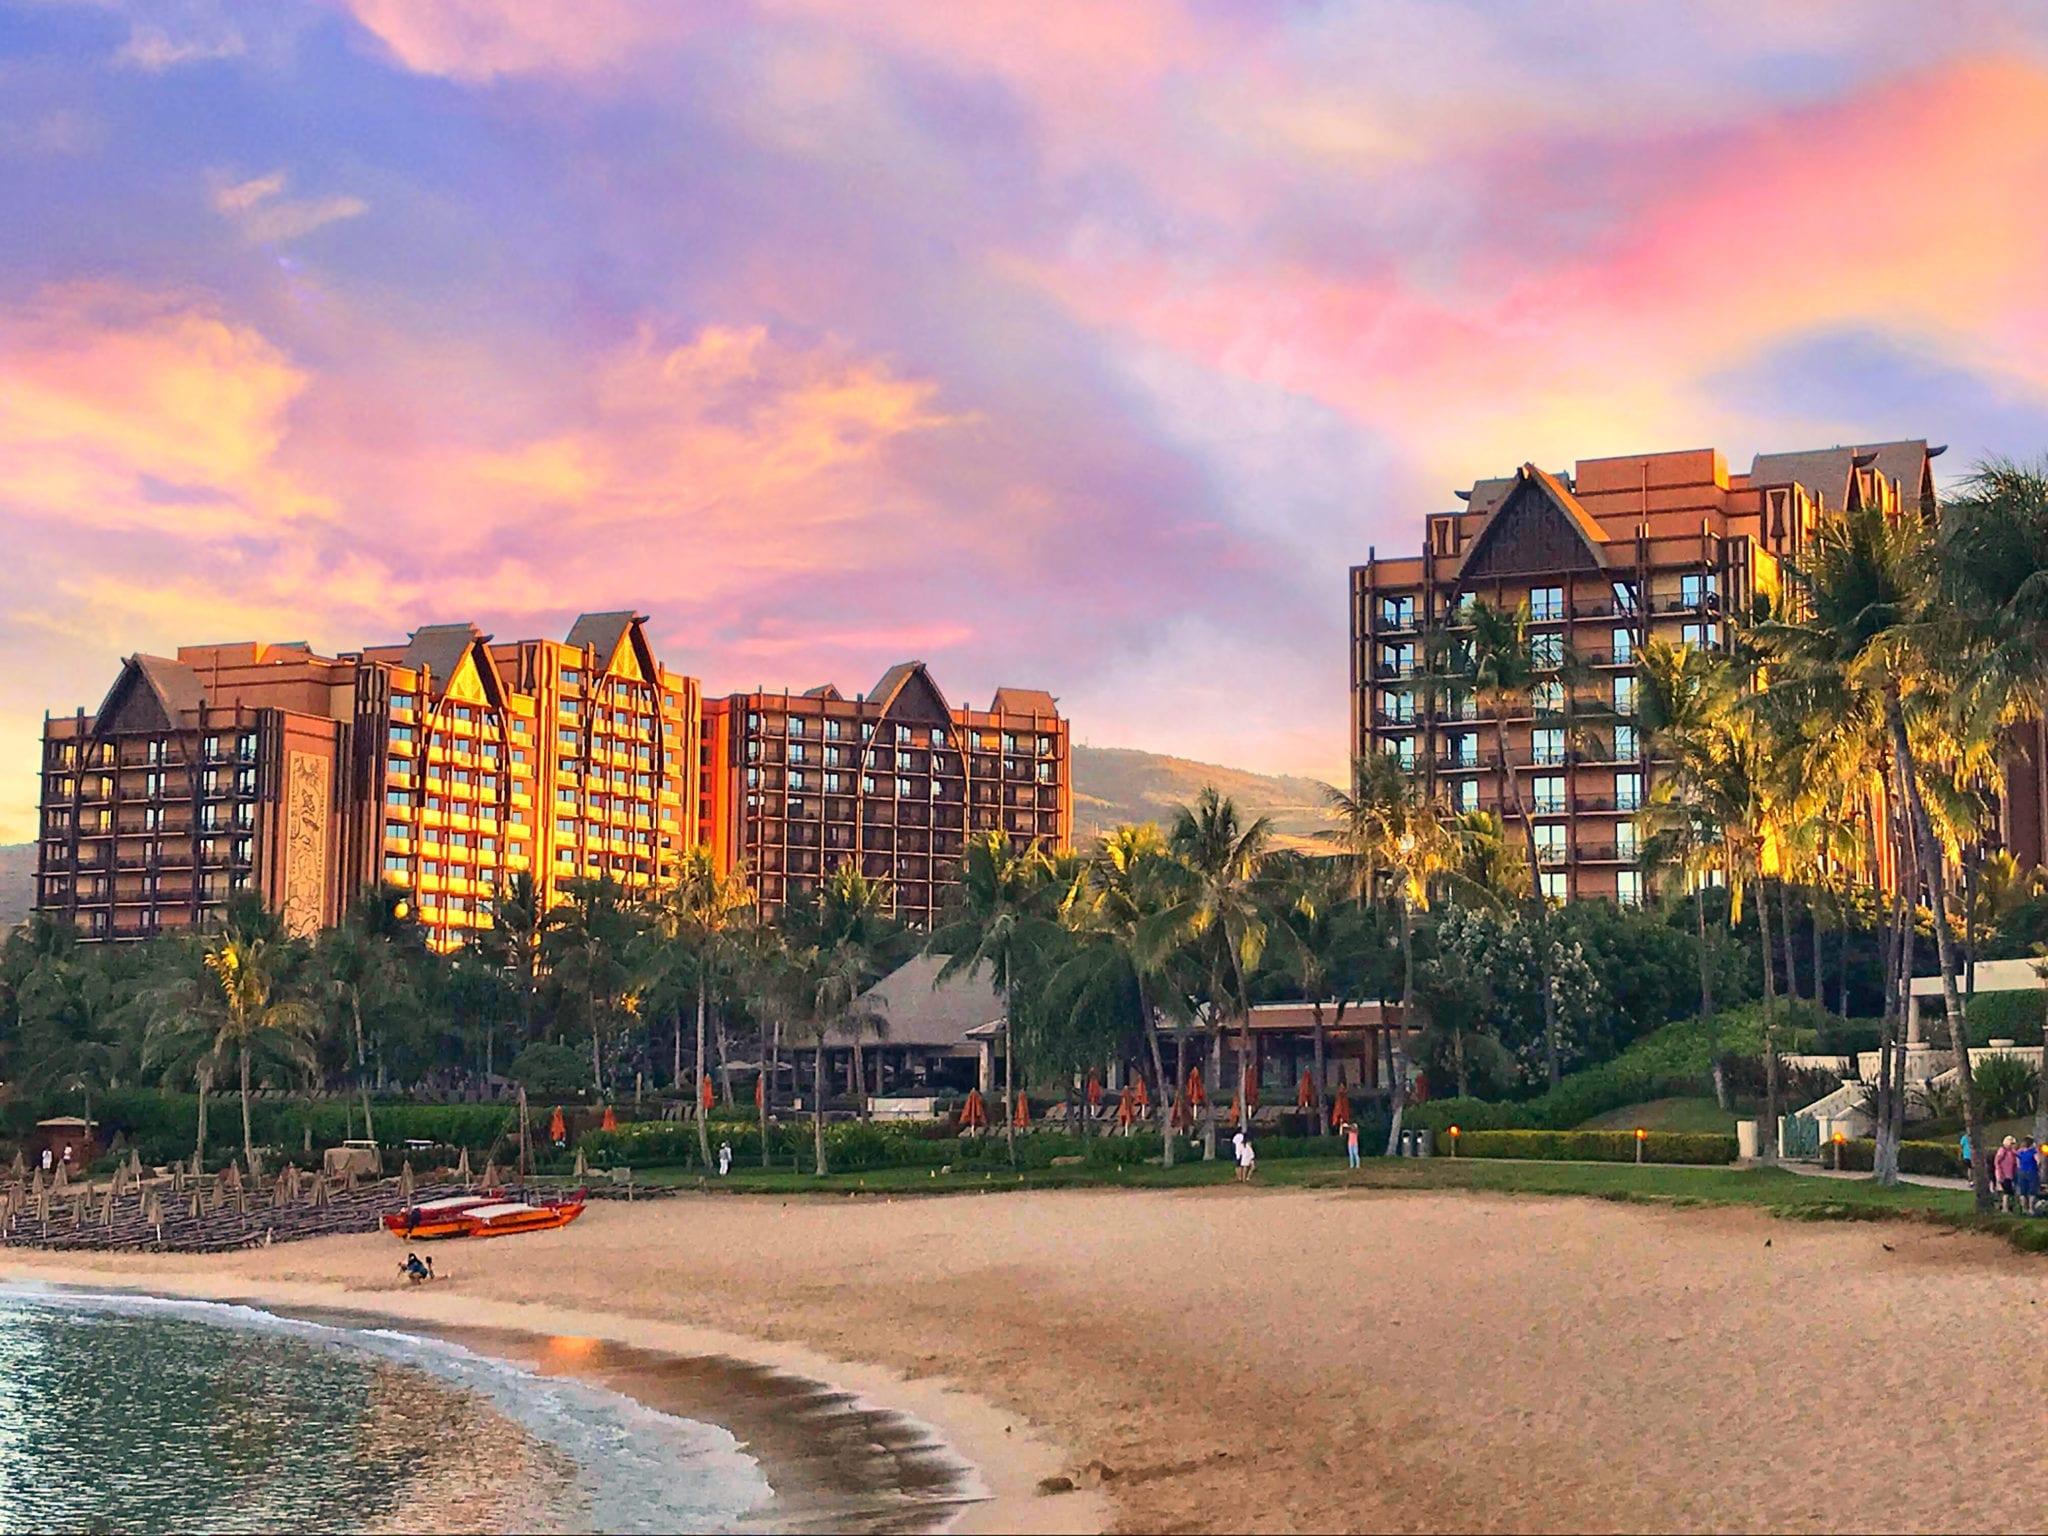 Disney Aulani – Booking and Saving at the Aulani Resort